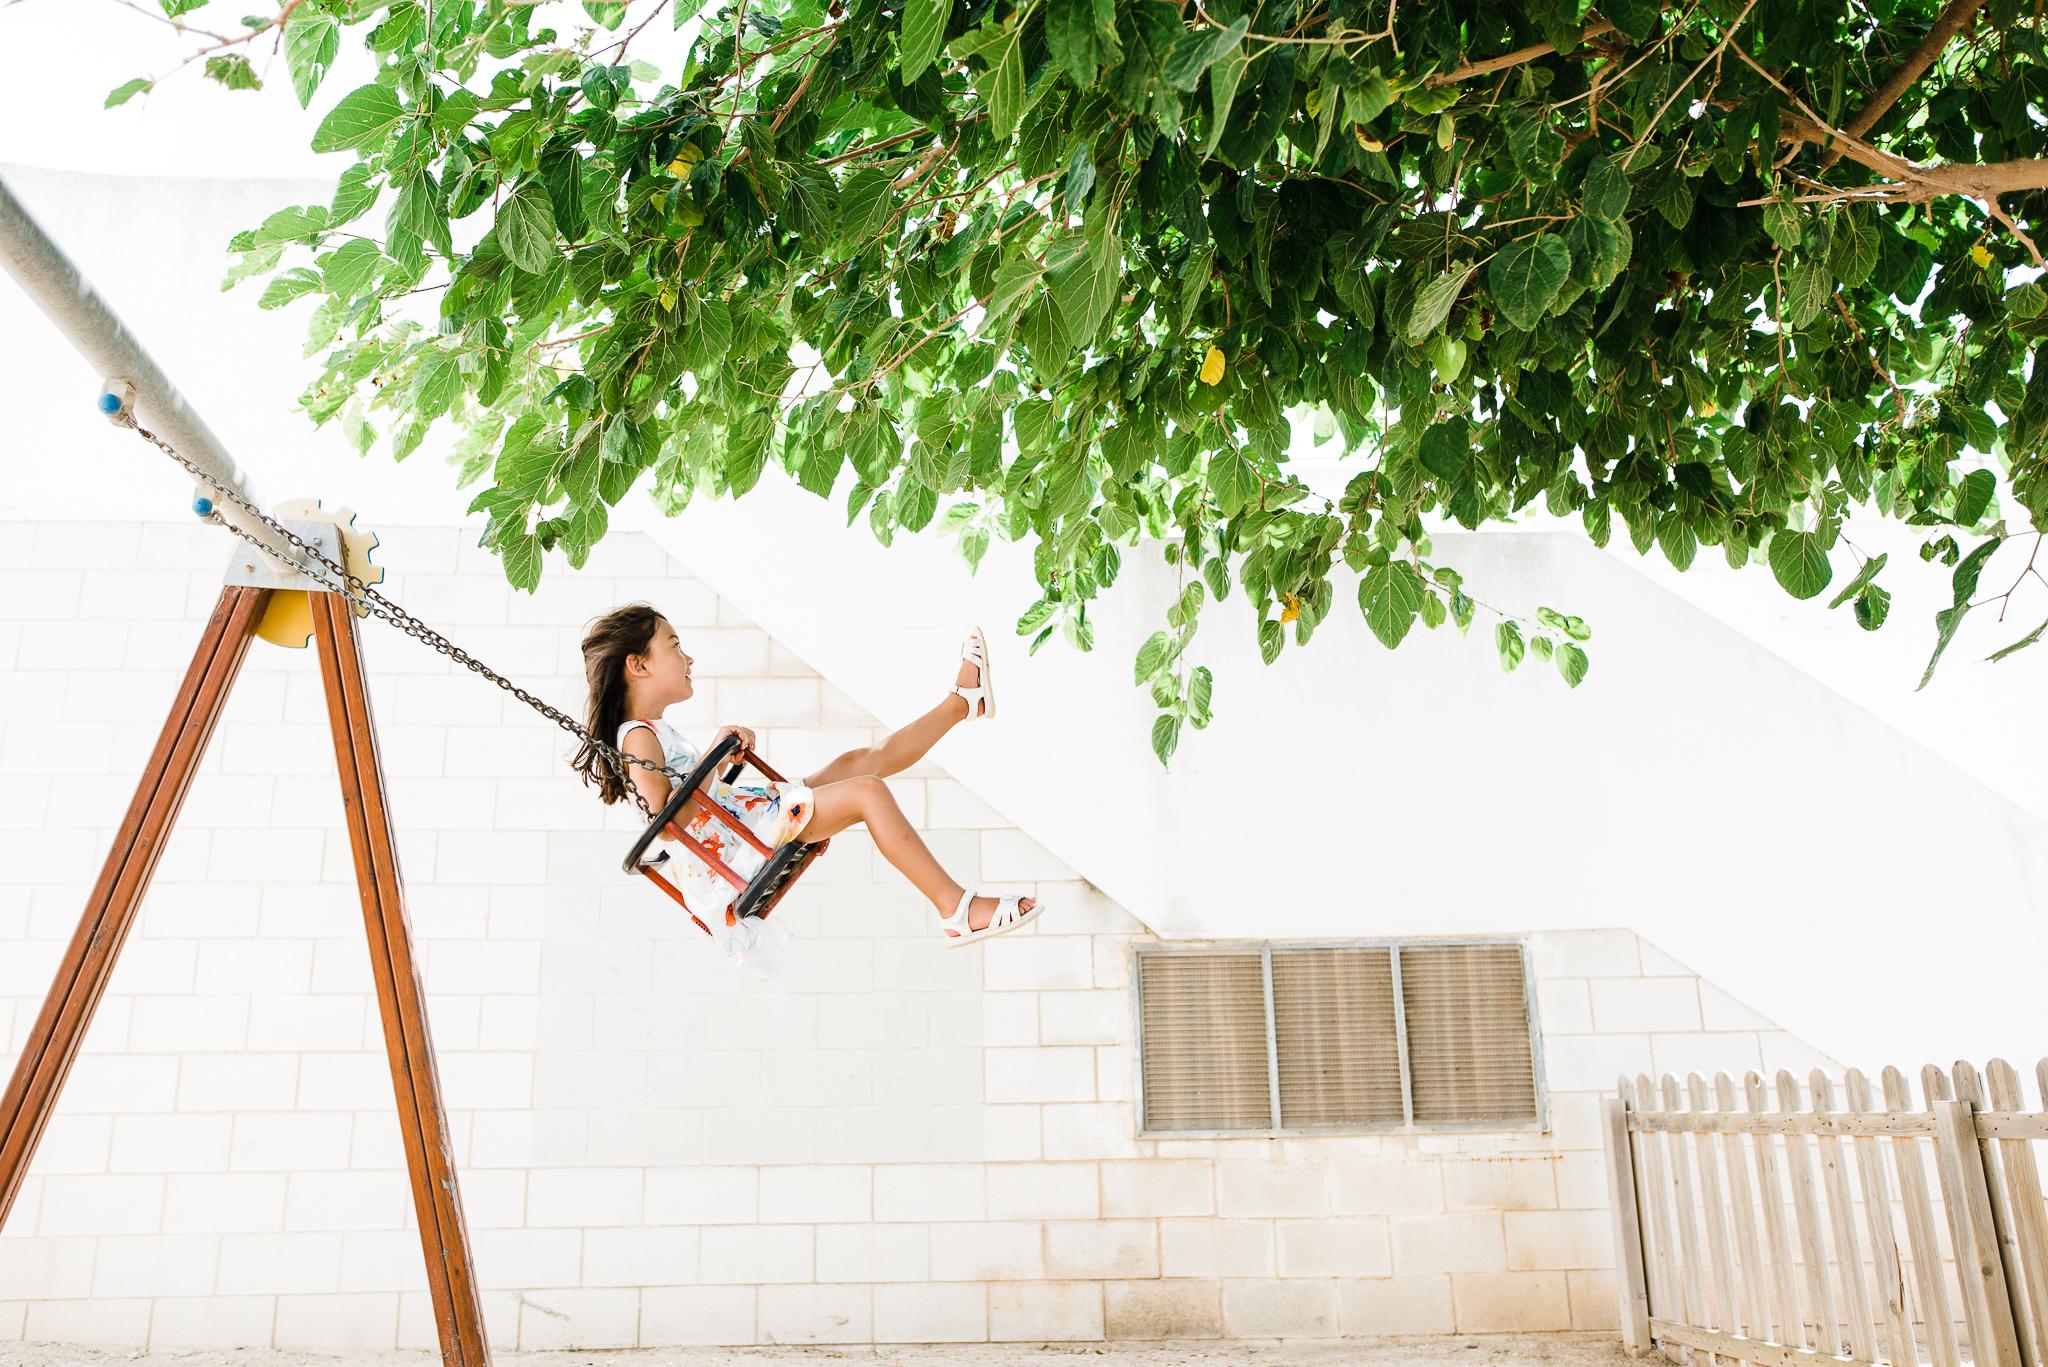 award winning image girl on swings